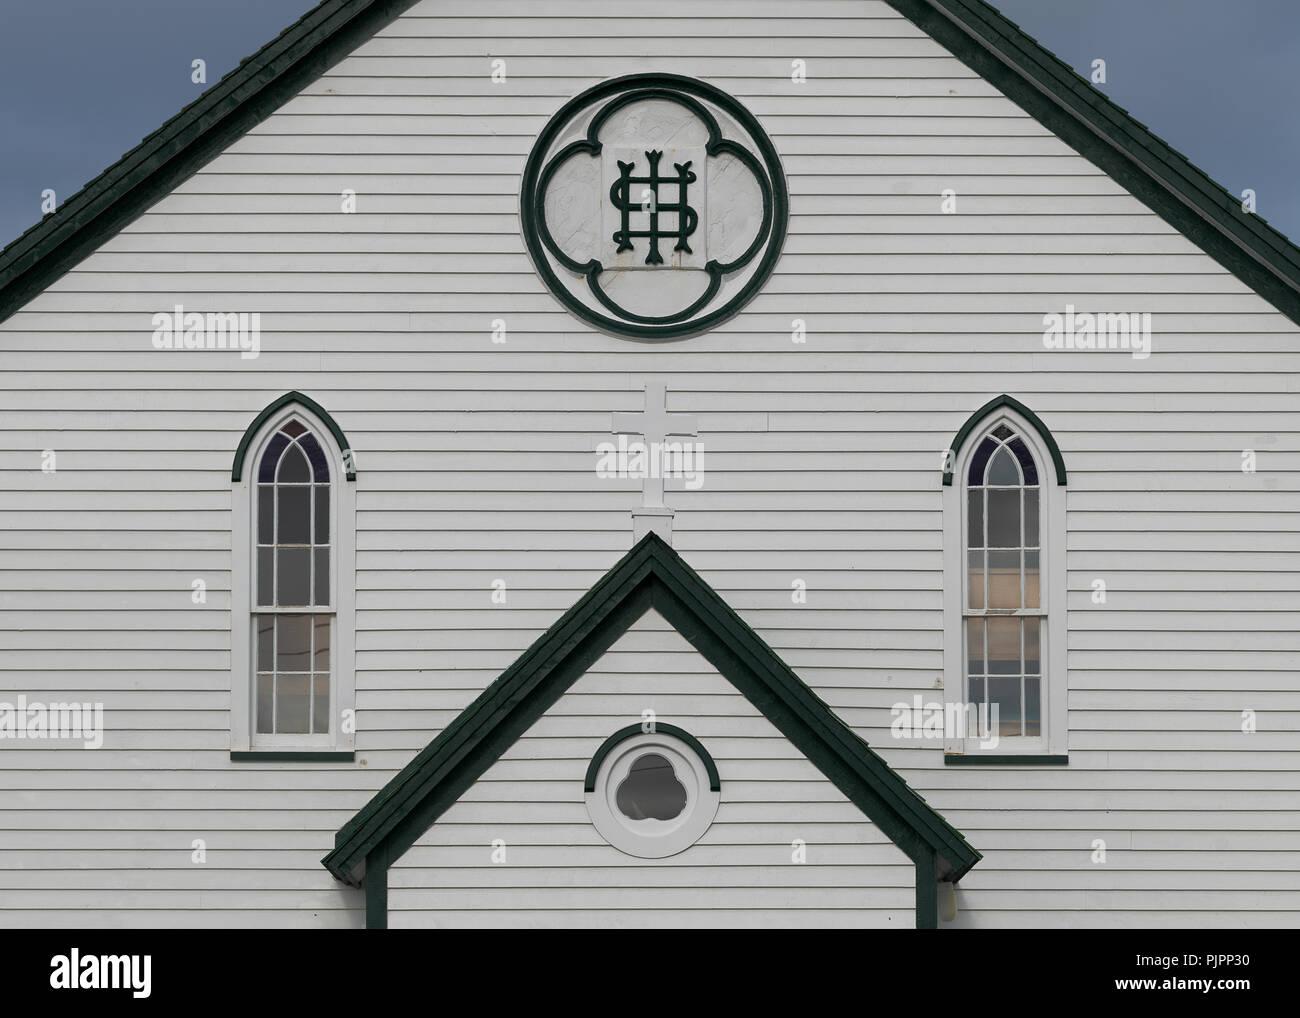 Closeup of the facade of the front of historic Saint Joseph's Roman Catholic Church on Chapel Hill in Bonavista, Newfoundland and Labrador - Stock Image